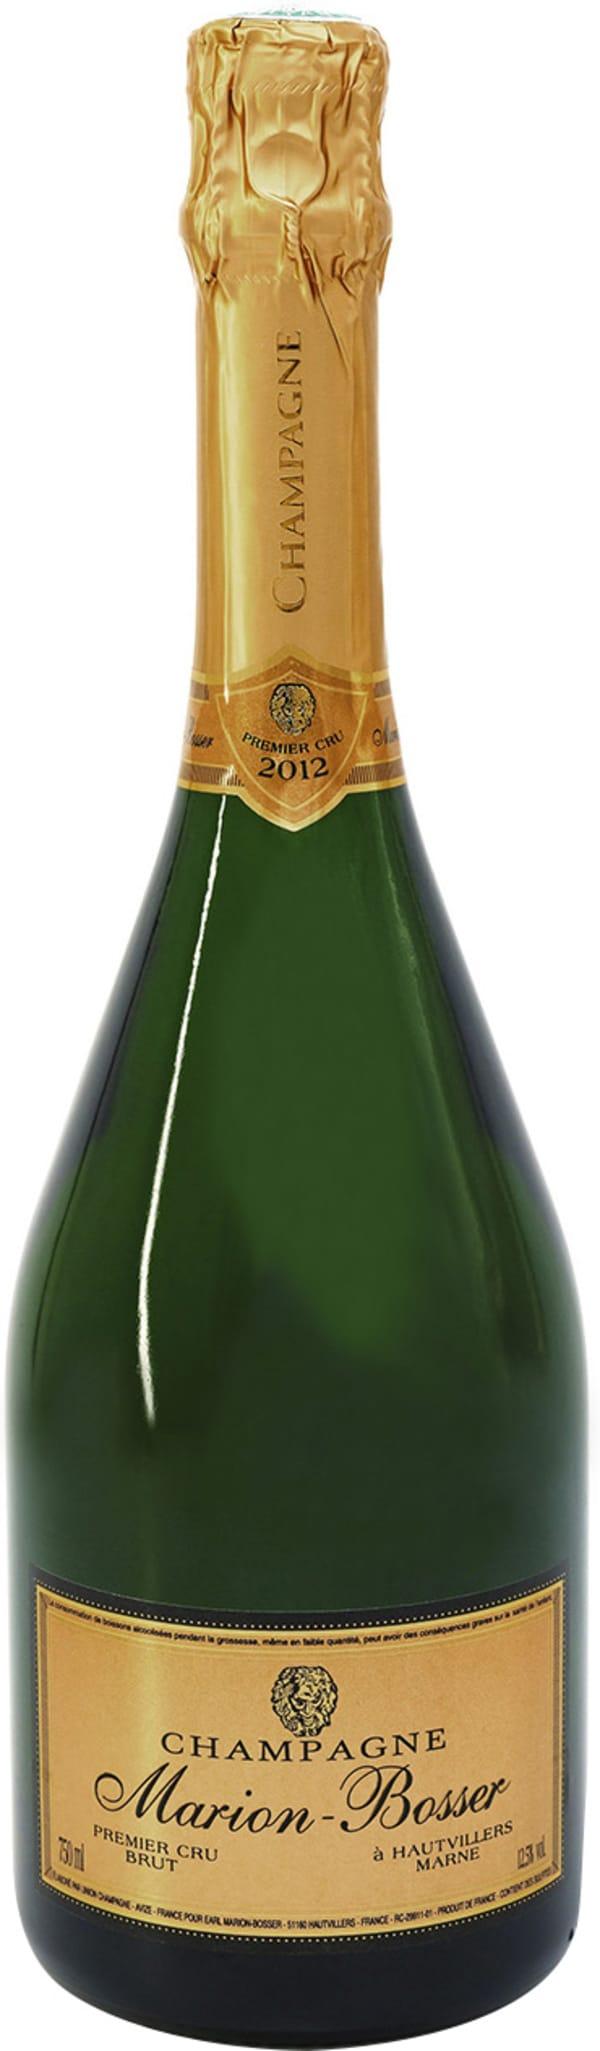 Marion-Bosser Premier Cru Champagne Brut 2008